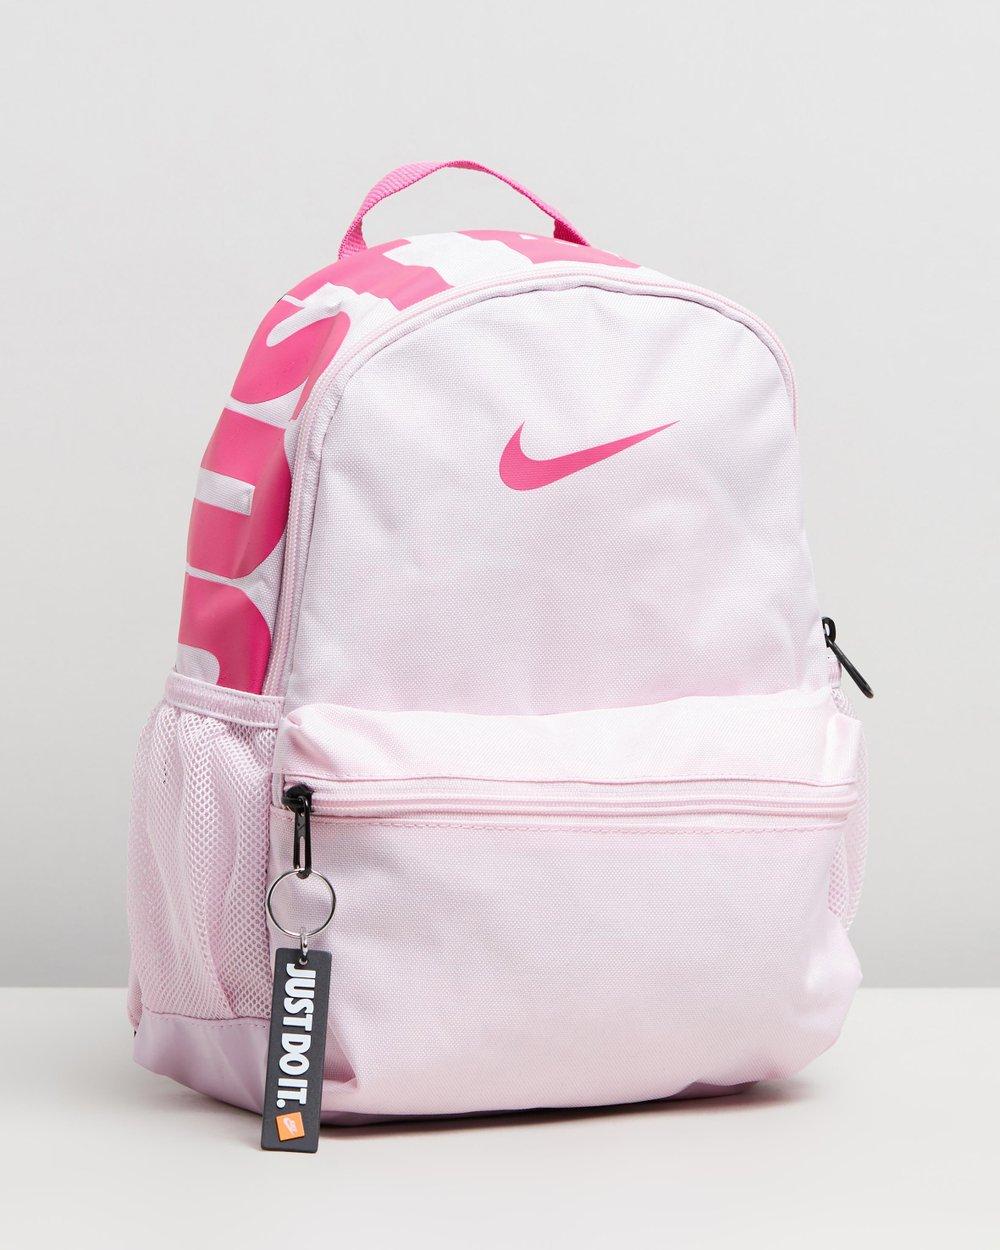 1c4fd33a91ce5 Brasilia Just Do It Backpack - Teens by Nike Kids Online